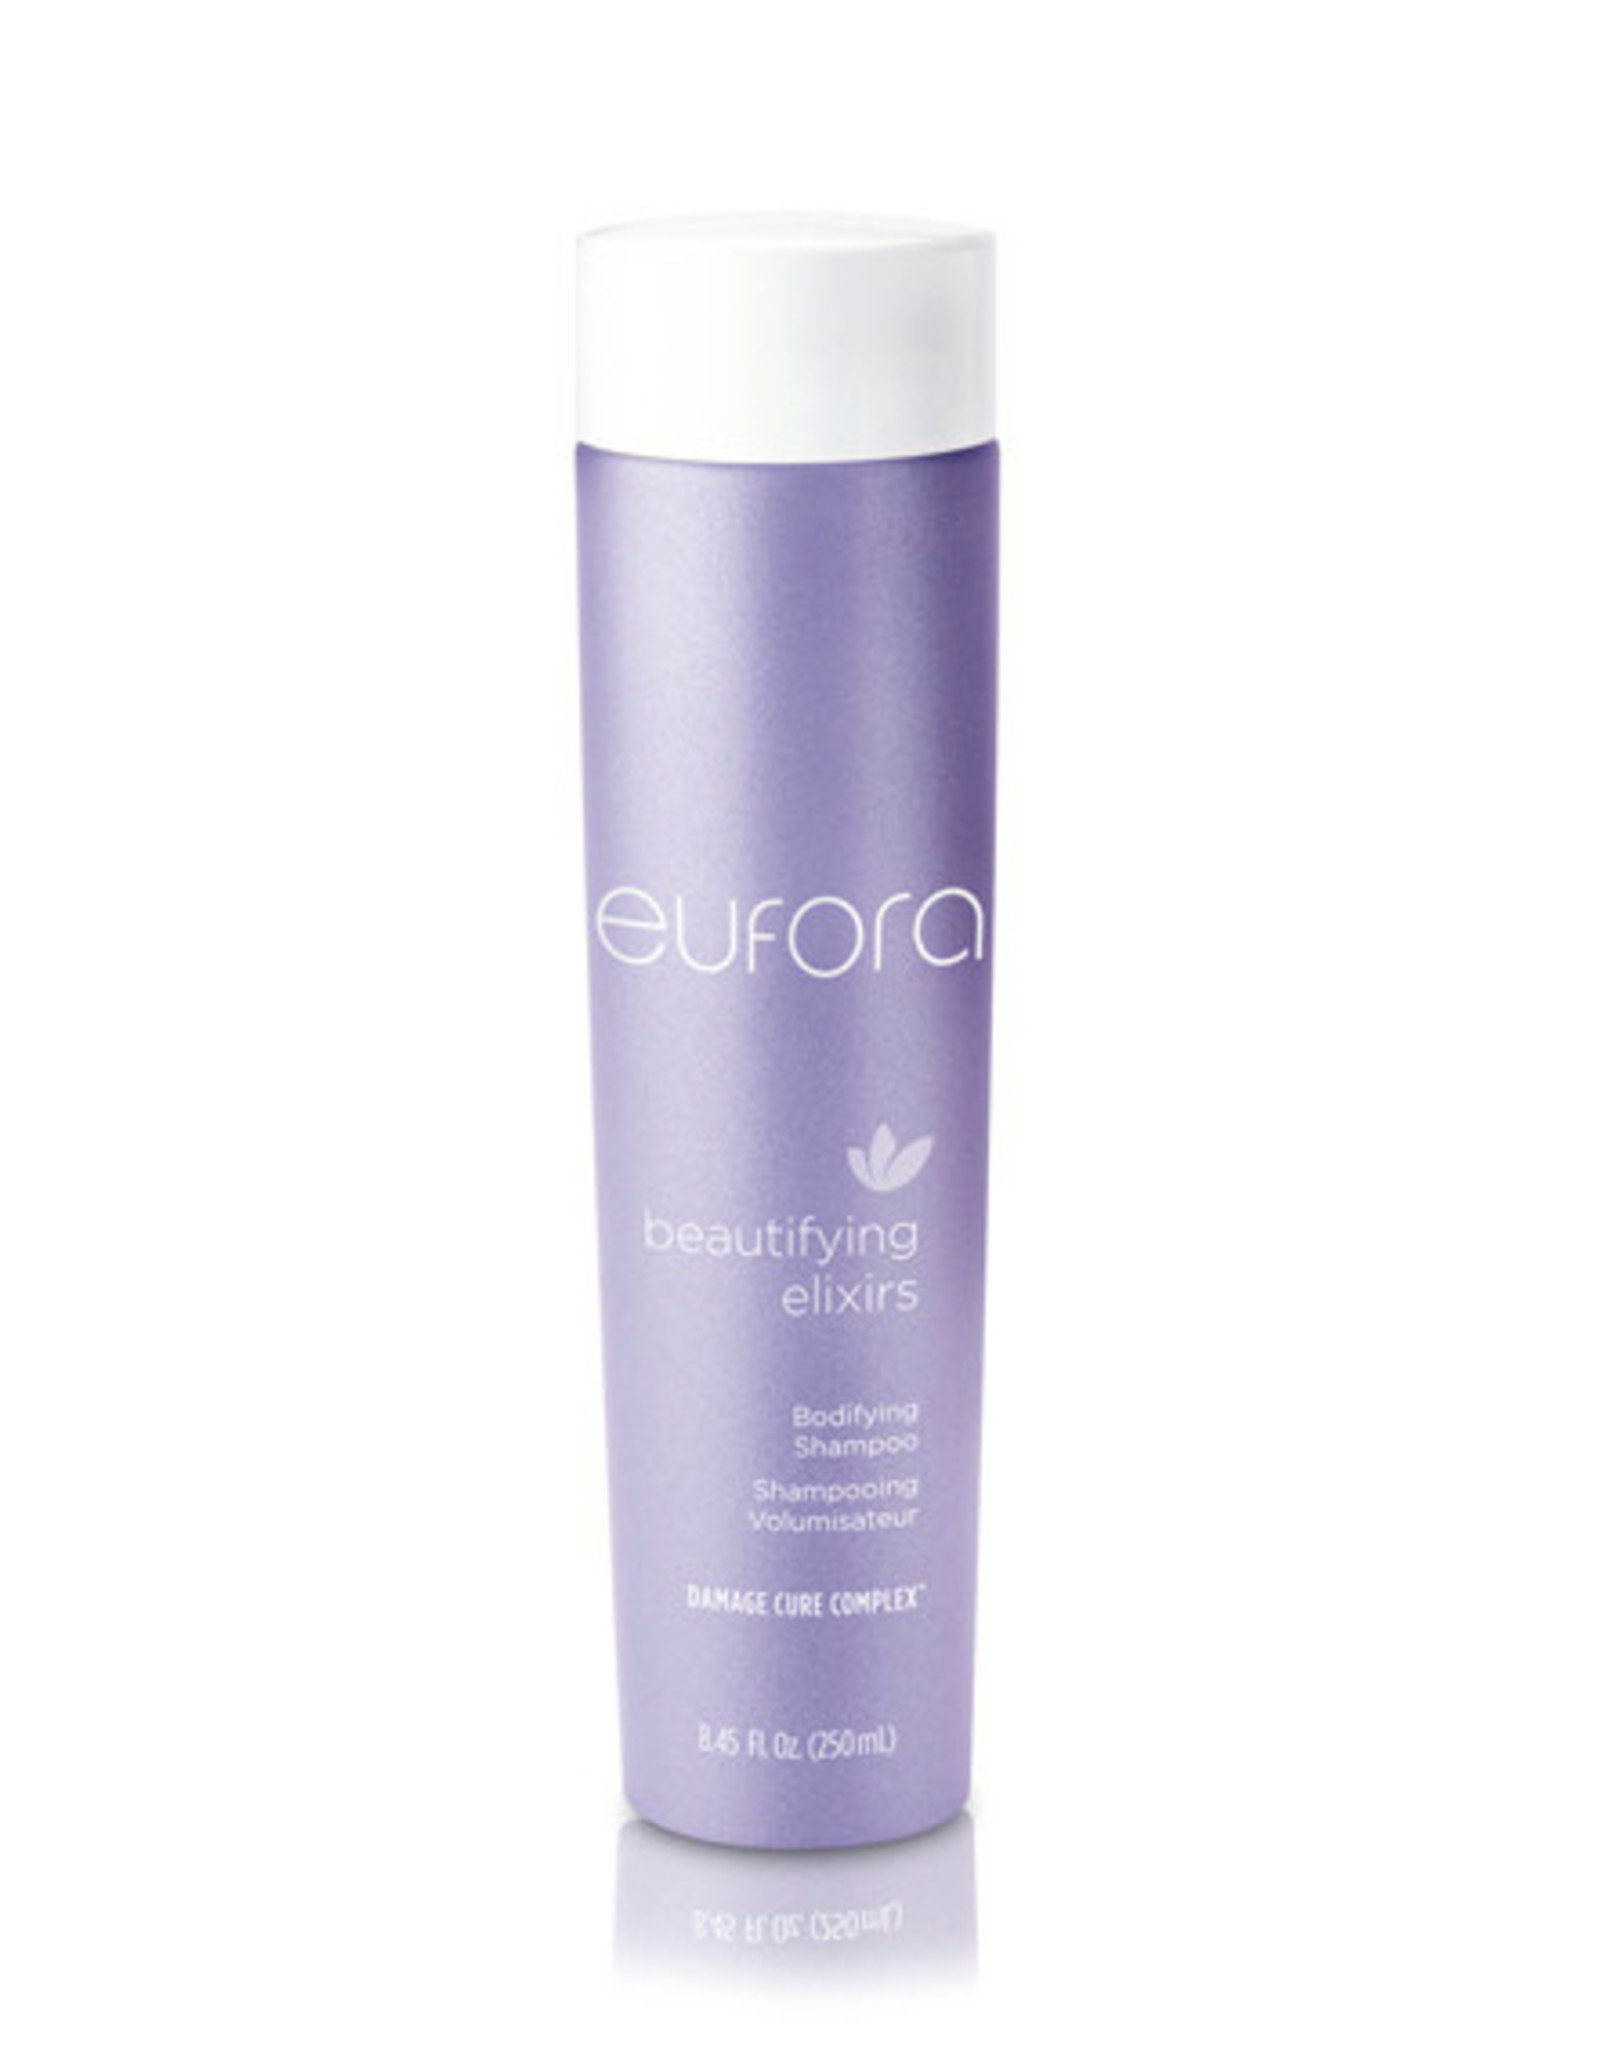 Eufora Bodifying Shampoo